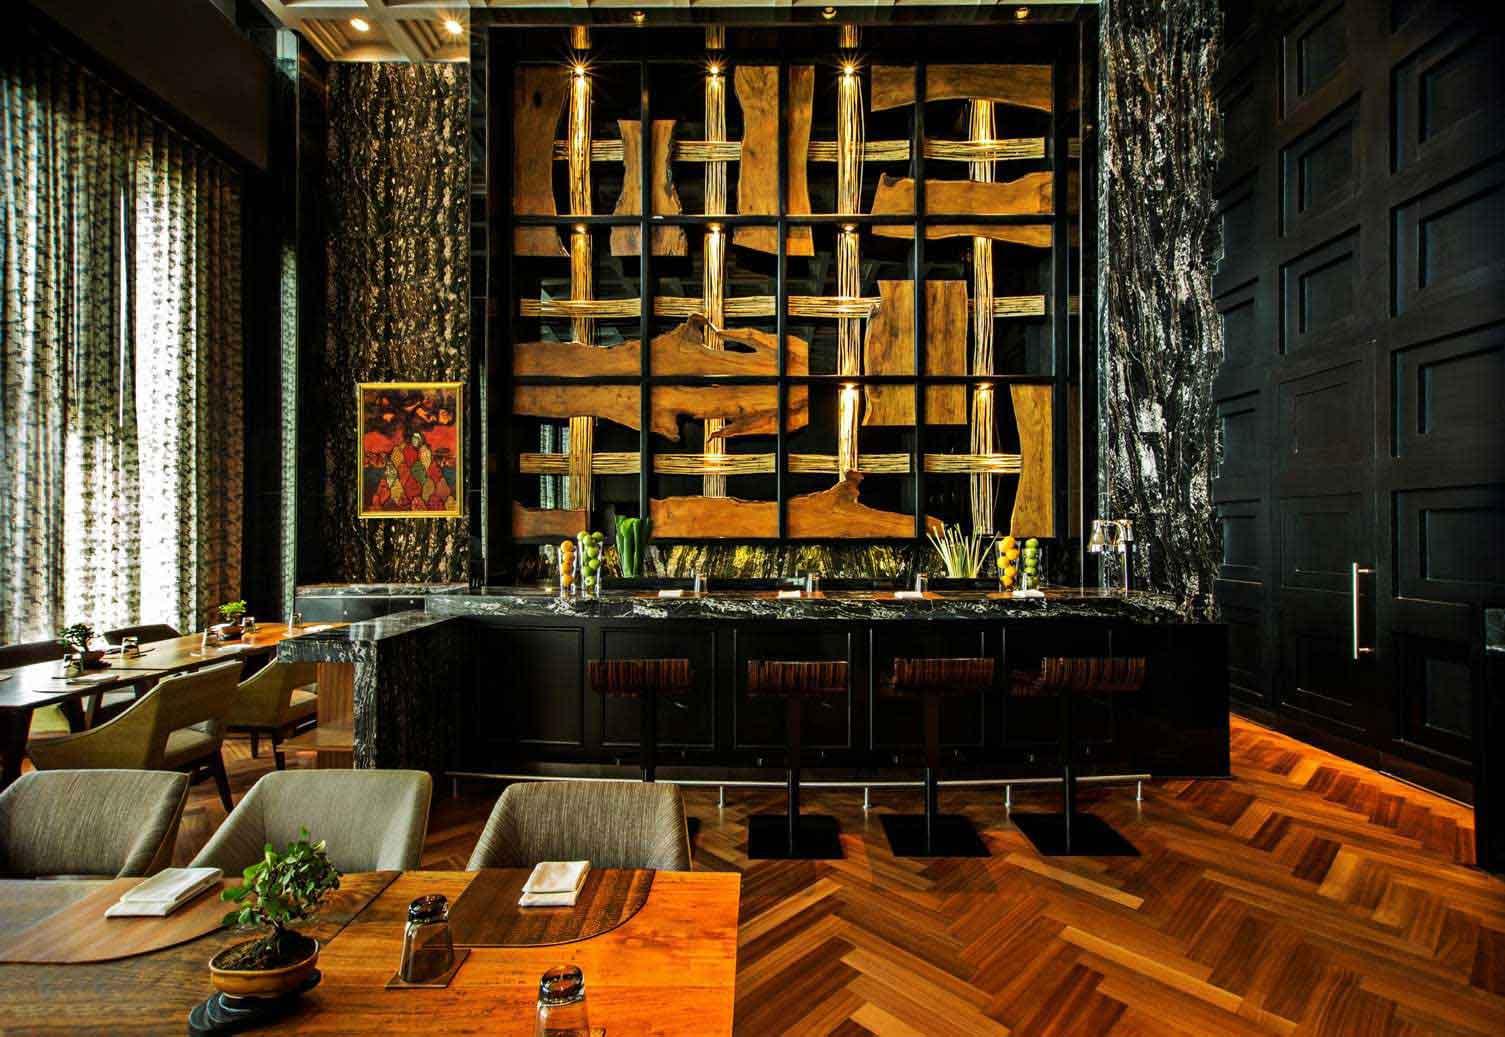 Yuuka Restaurant in The St. Regis Mumbai - Club Marriott South Asia